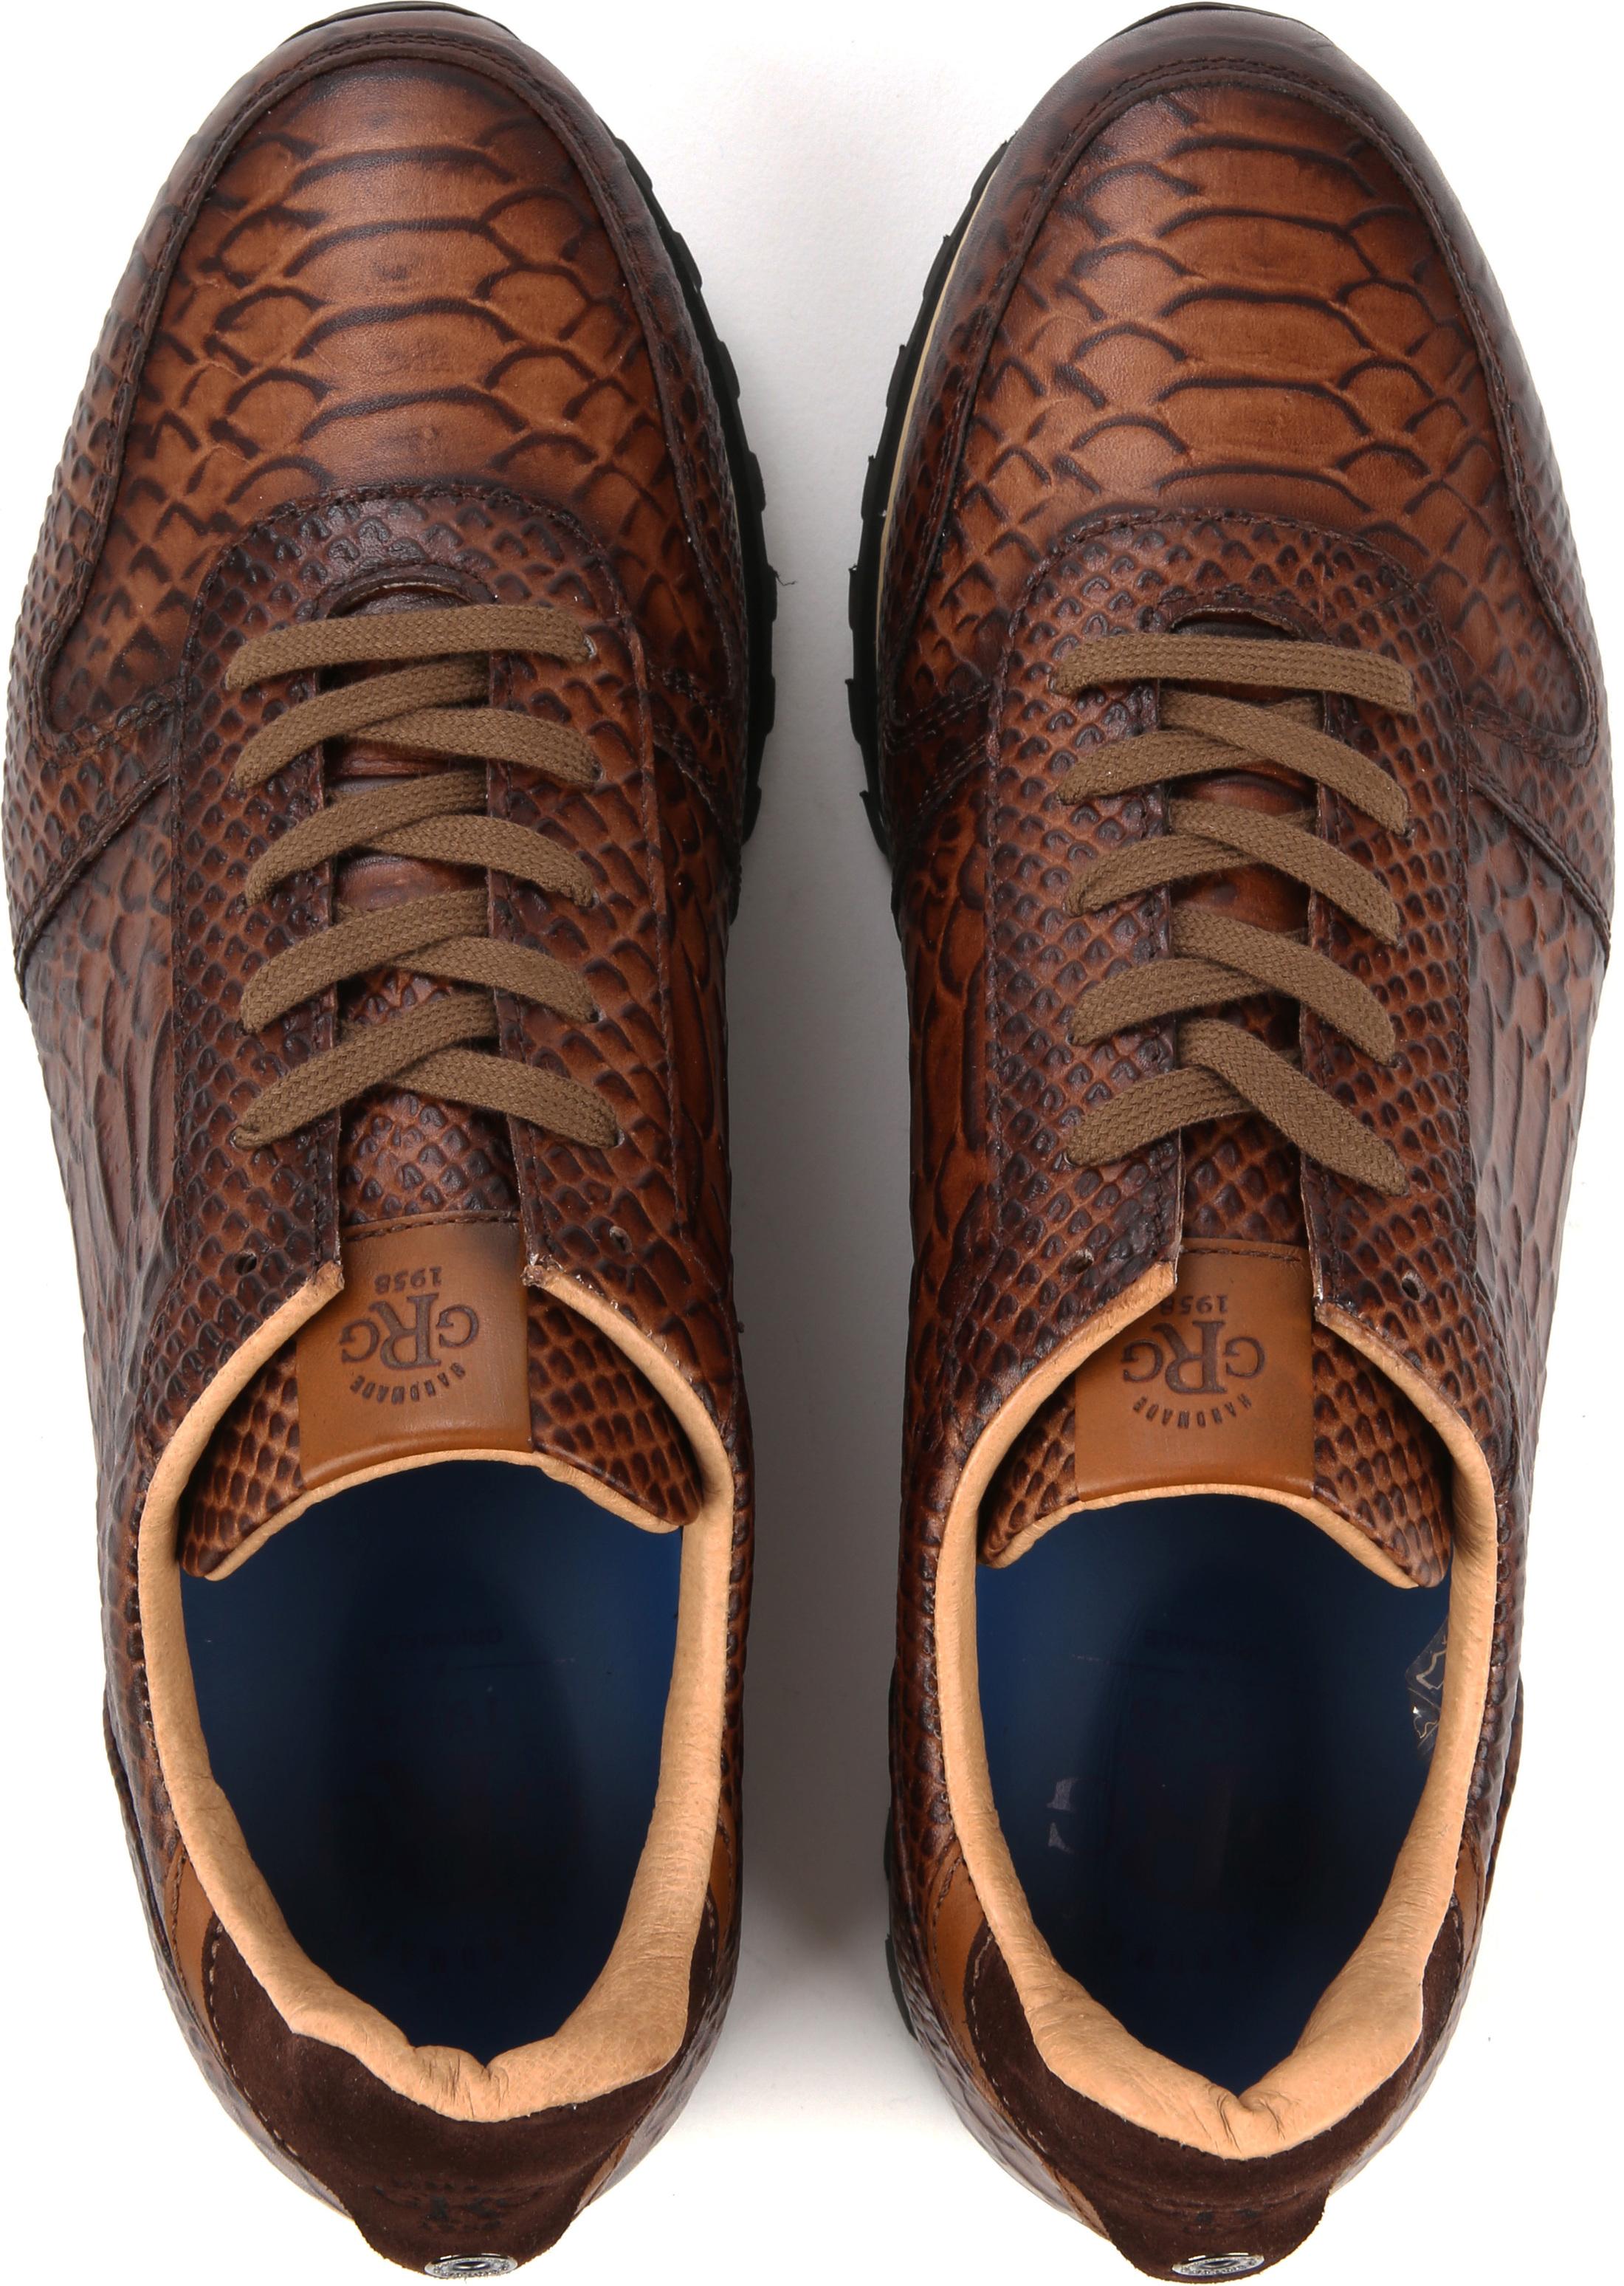 Giorgio Sneaker Anaconda Cognac foto 4